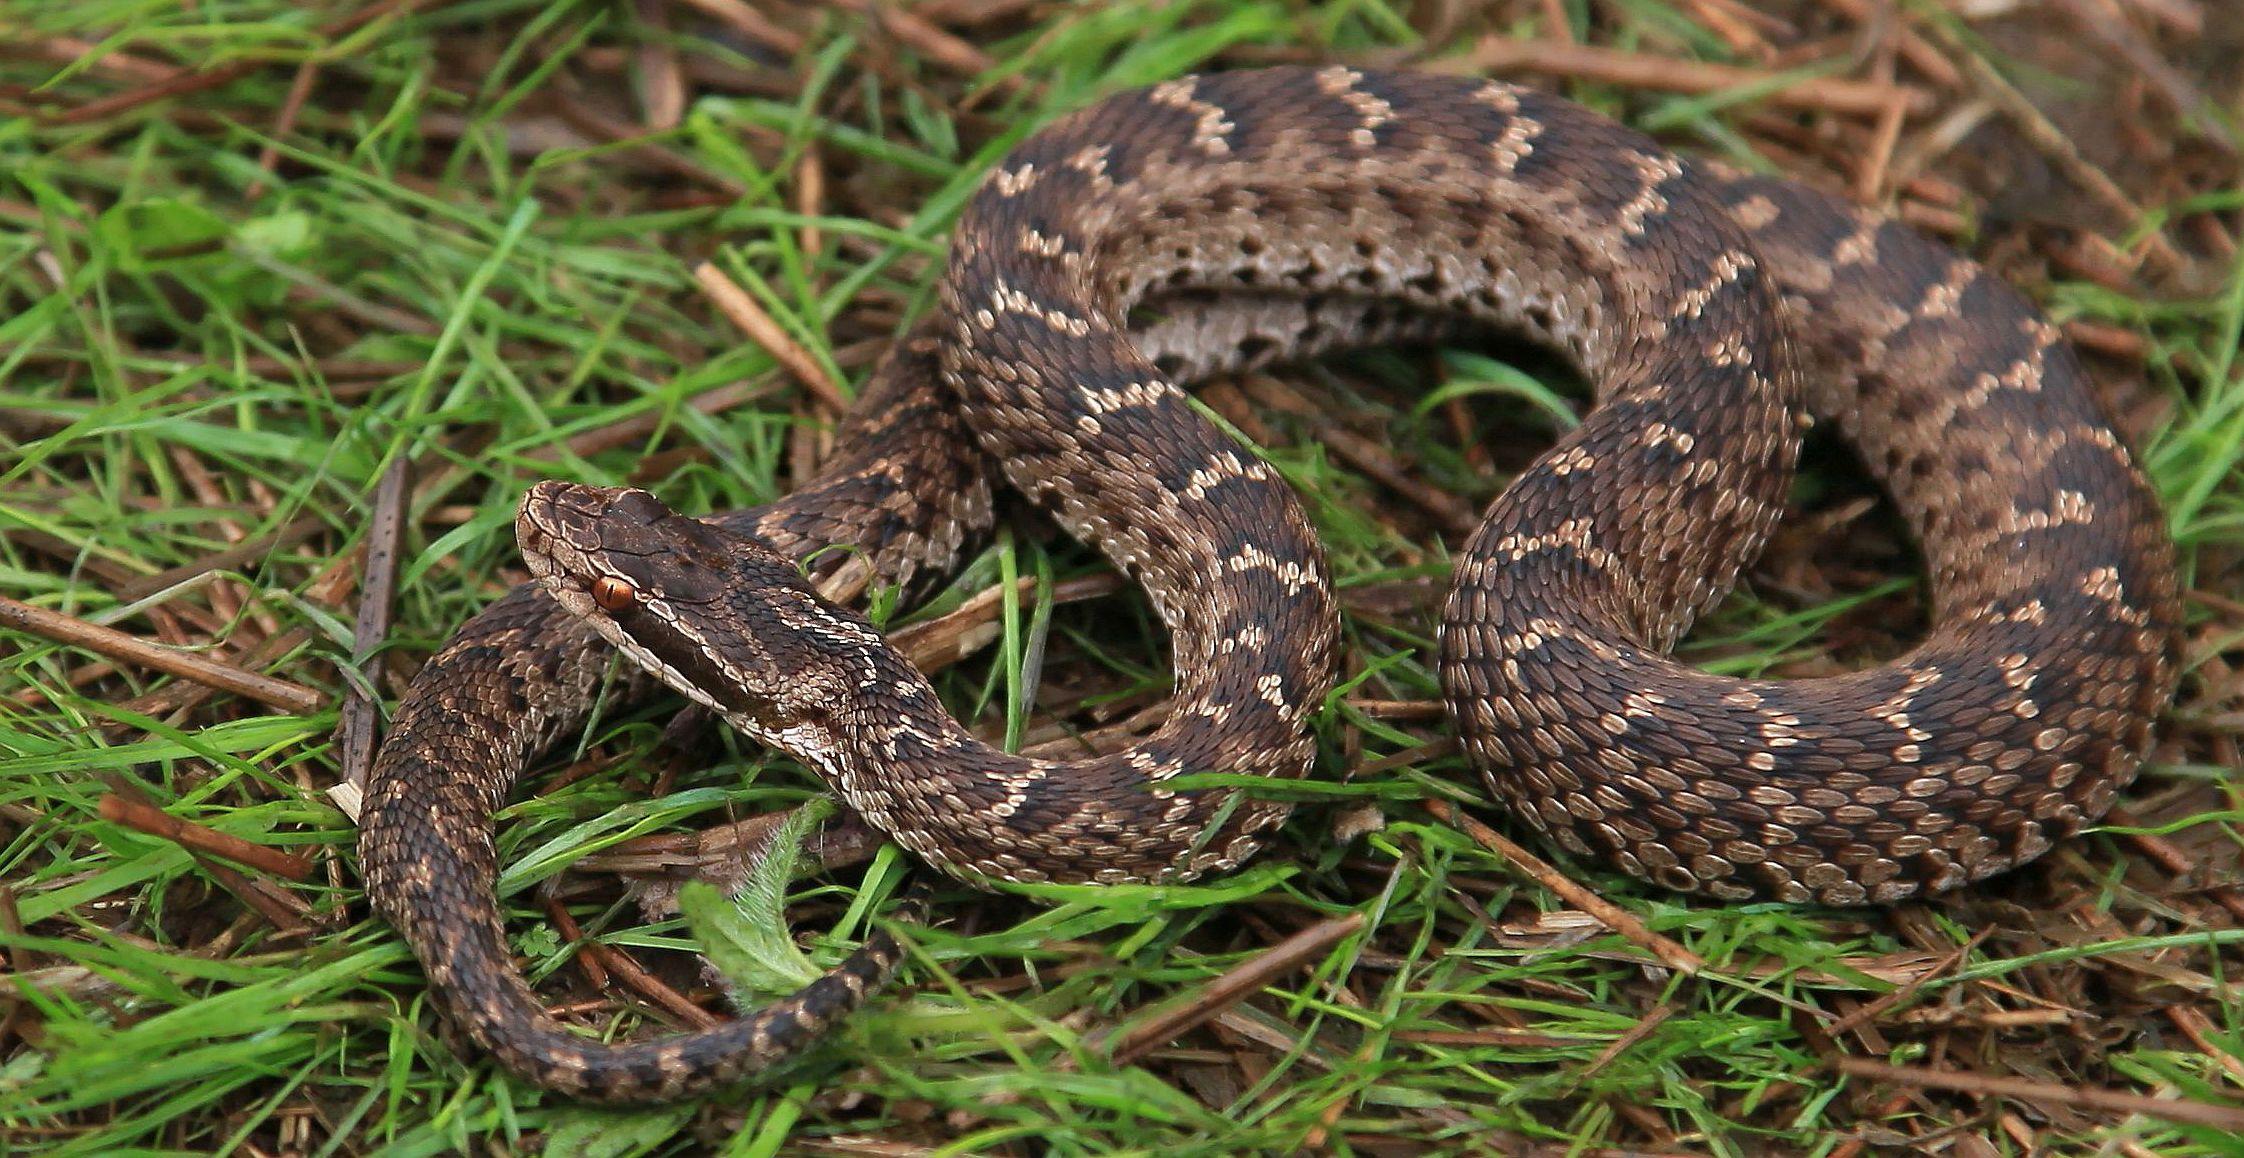 змеи амурской области фото и название любисток описание выращивания